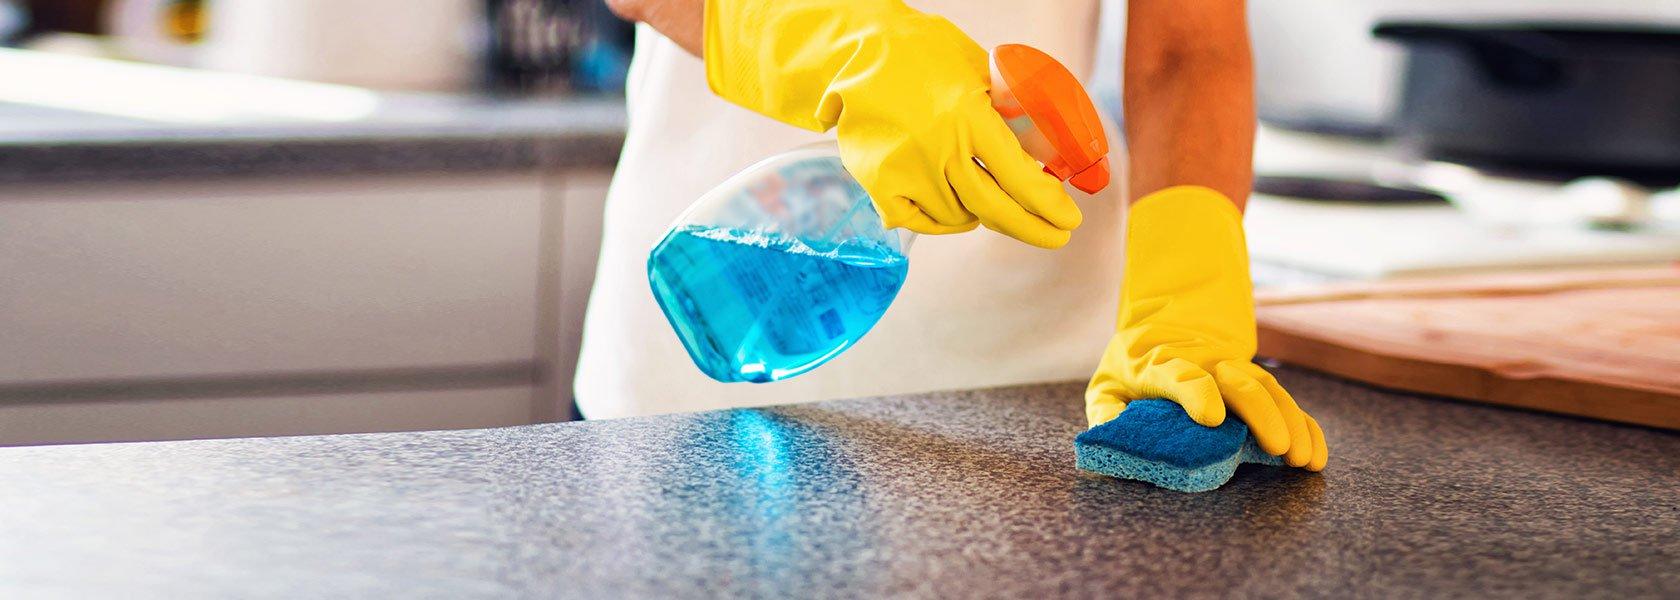 Deep Cleaning Services in Dubai & Abu Dhabi